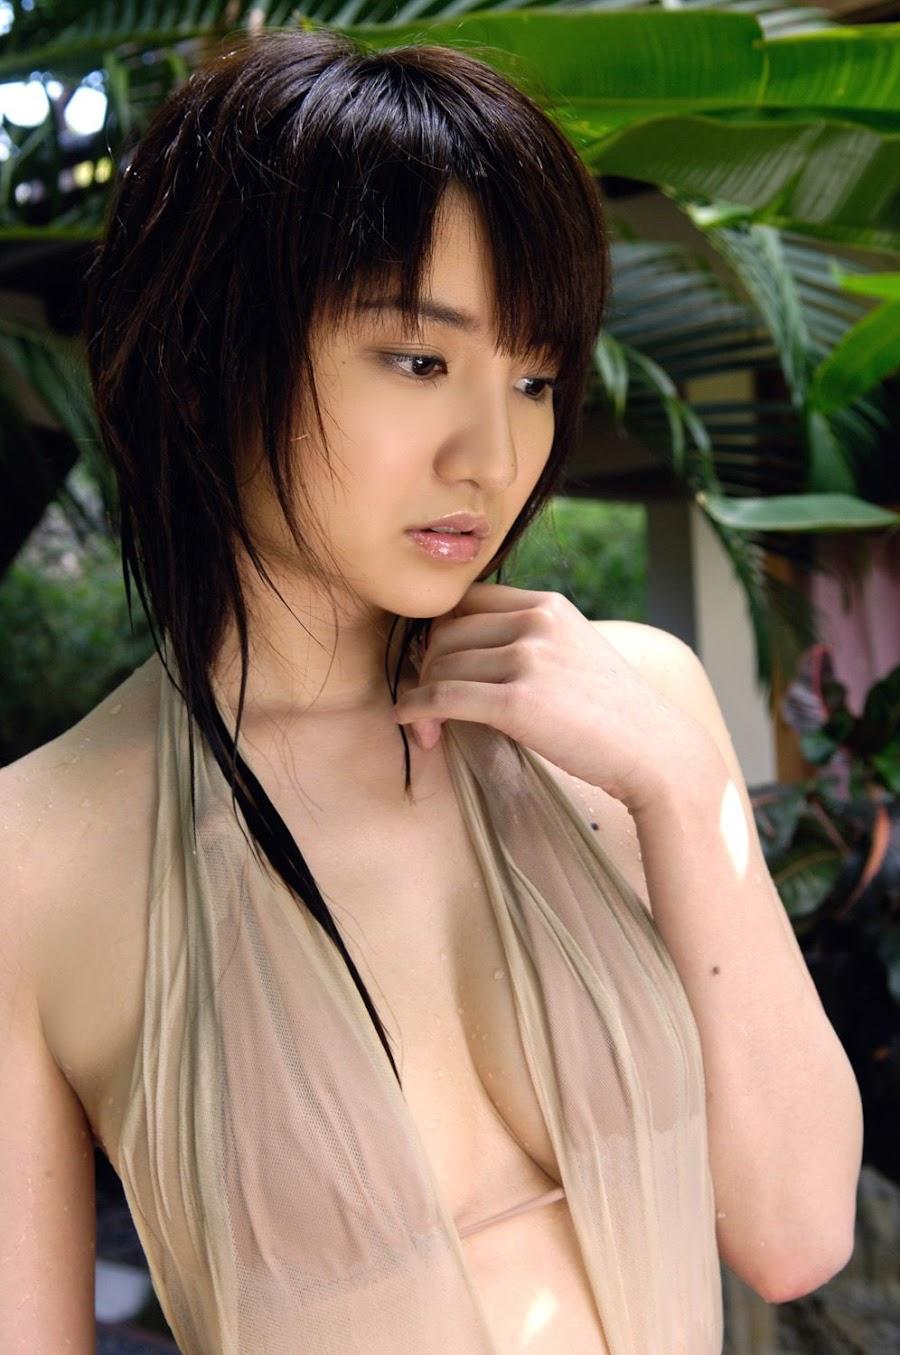 Nana Ozaki - sexy Japanese gravure idol